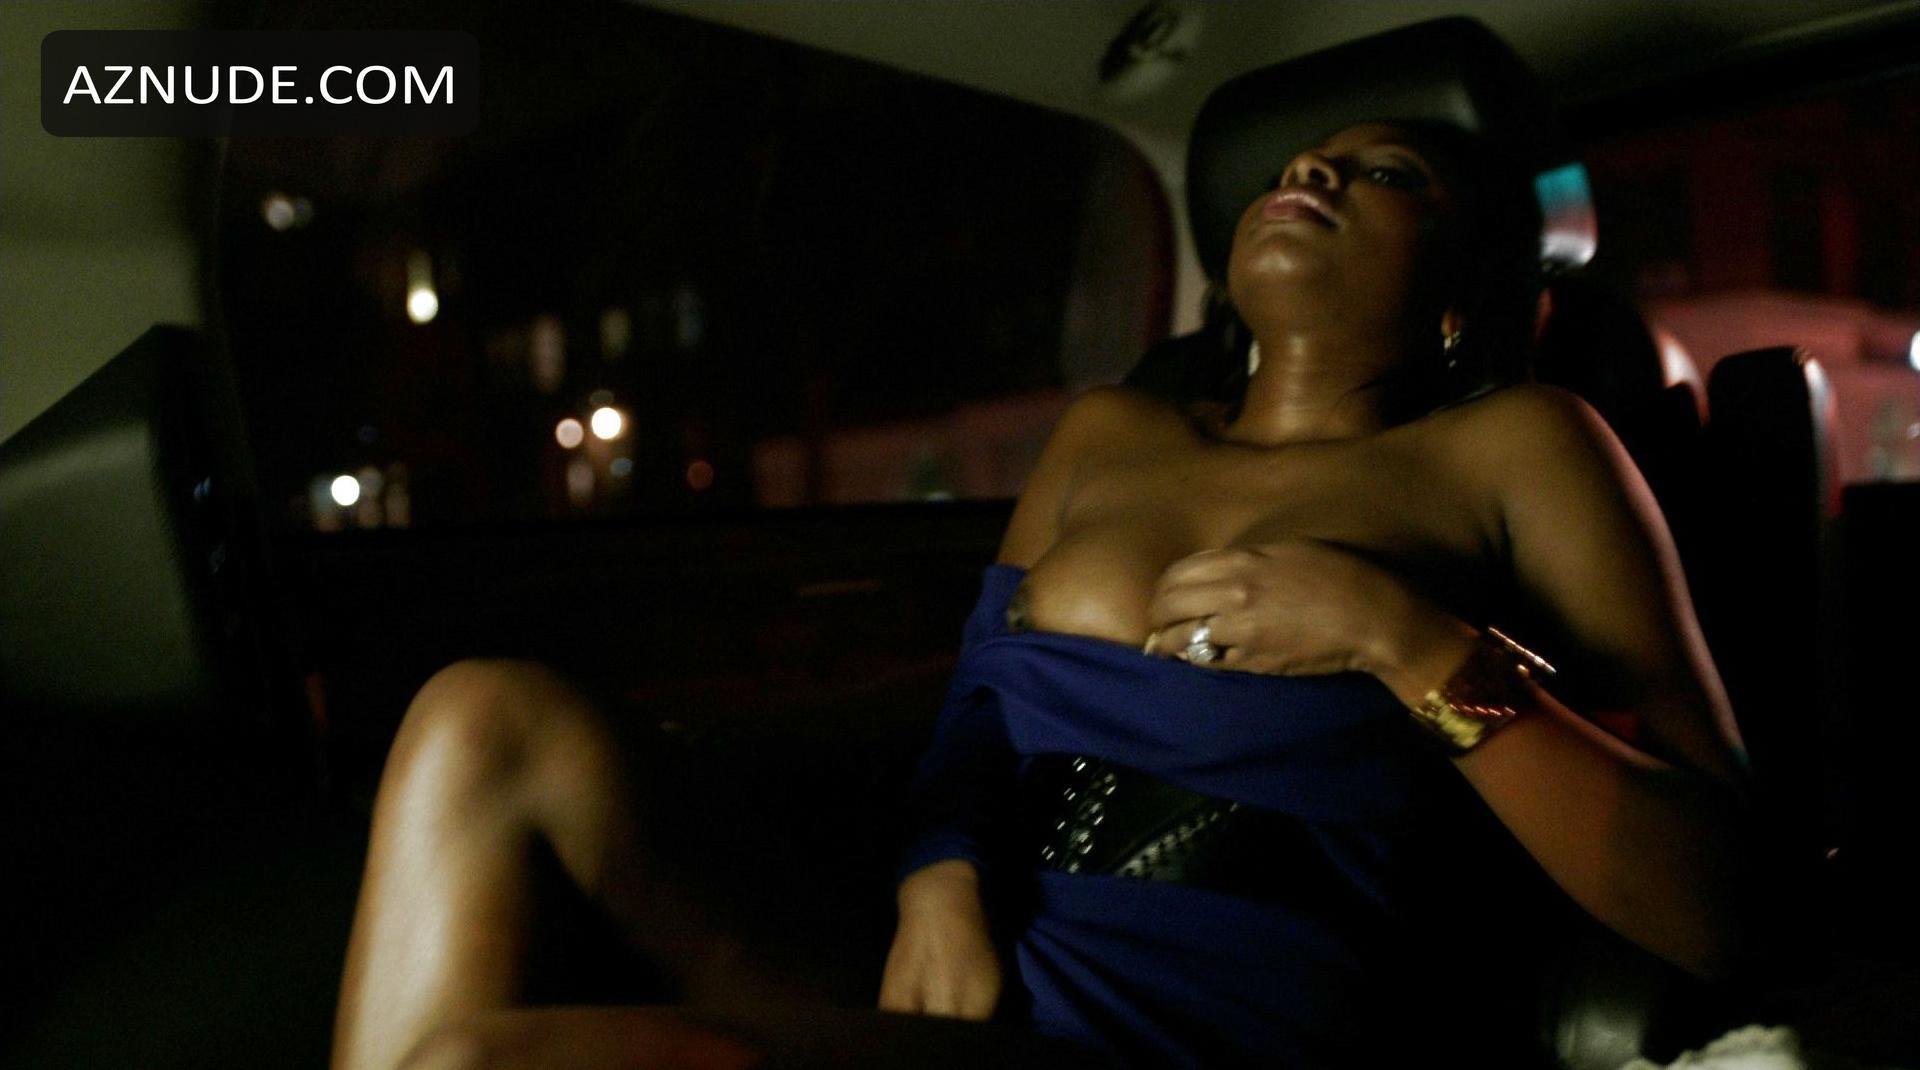 image Lela loren sex scenes in power seasons 1 2